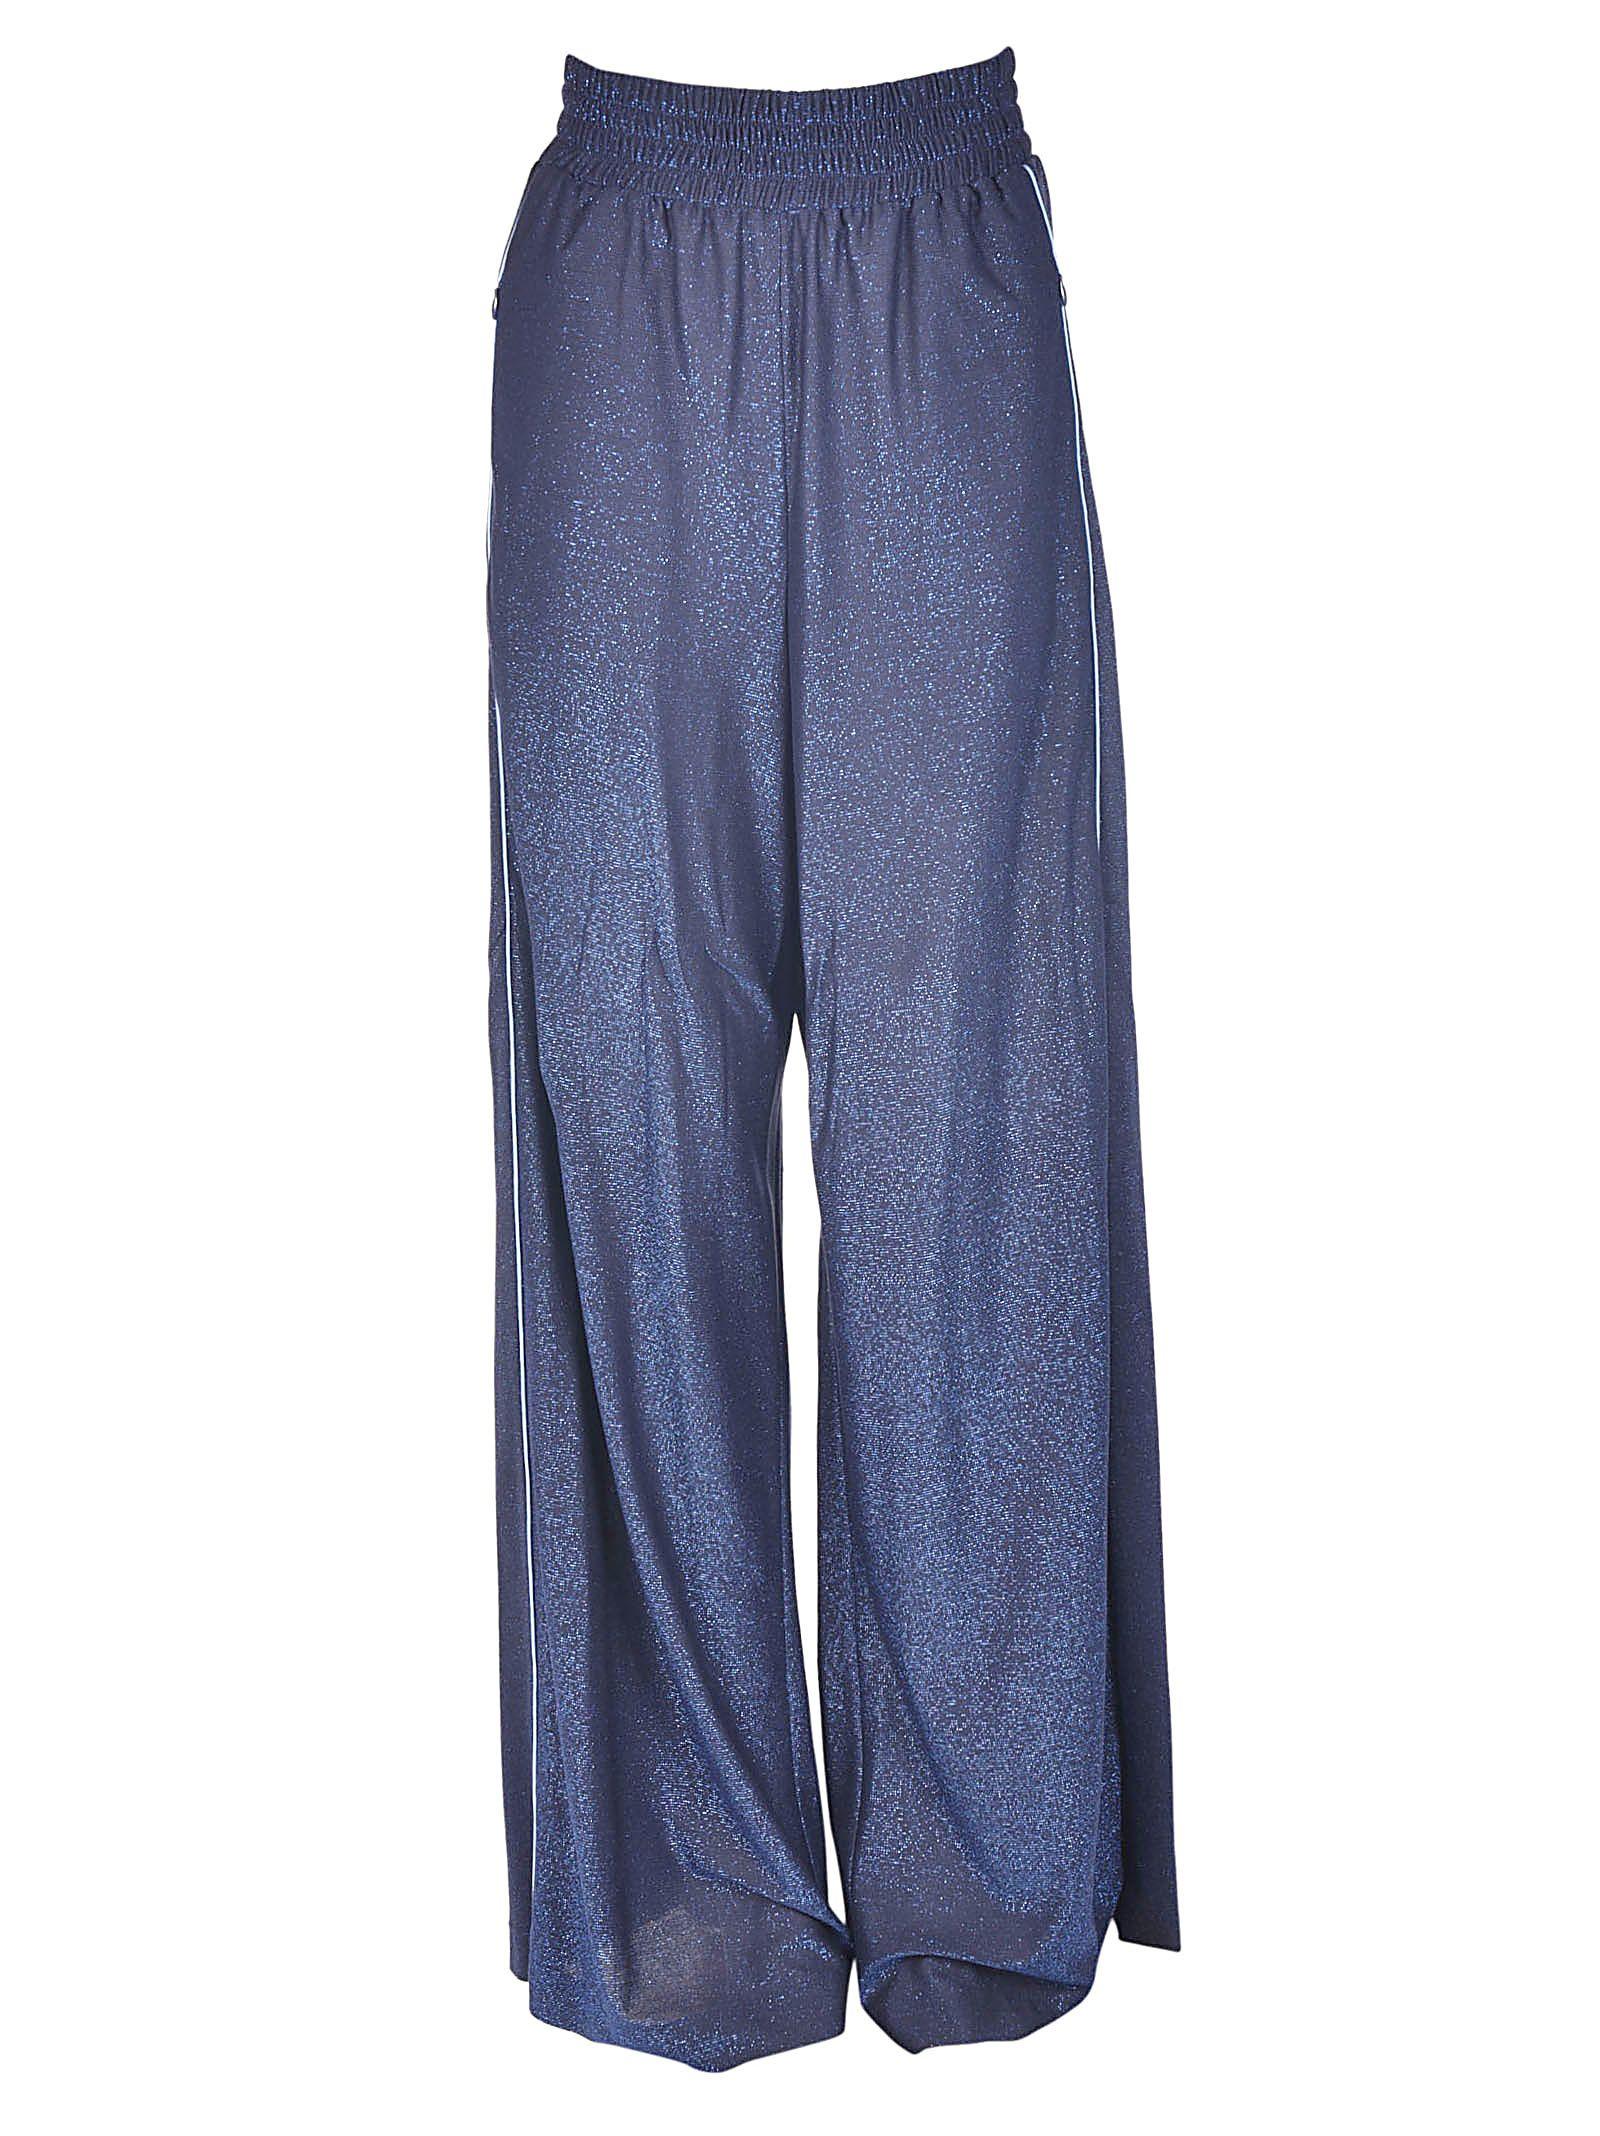 Pants for Women On Sale, navy, Viscose, 2017, 10 6 8 Golden Goose